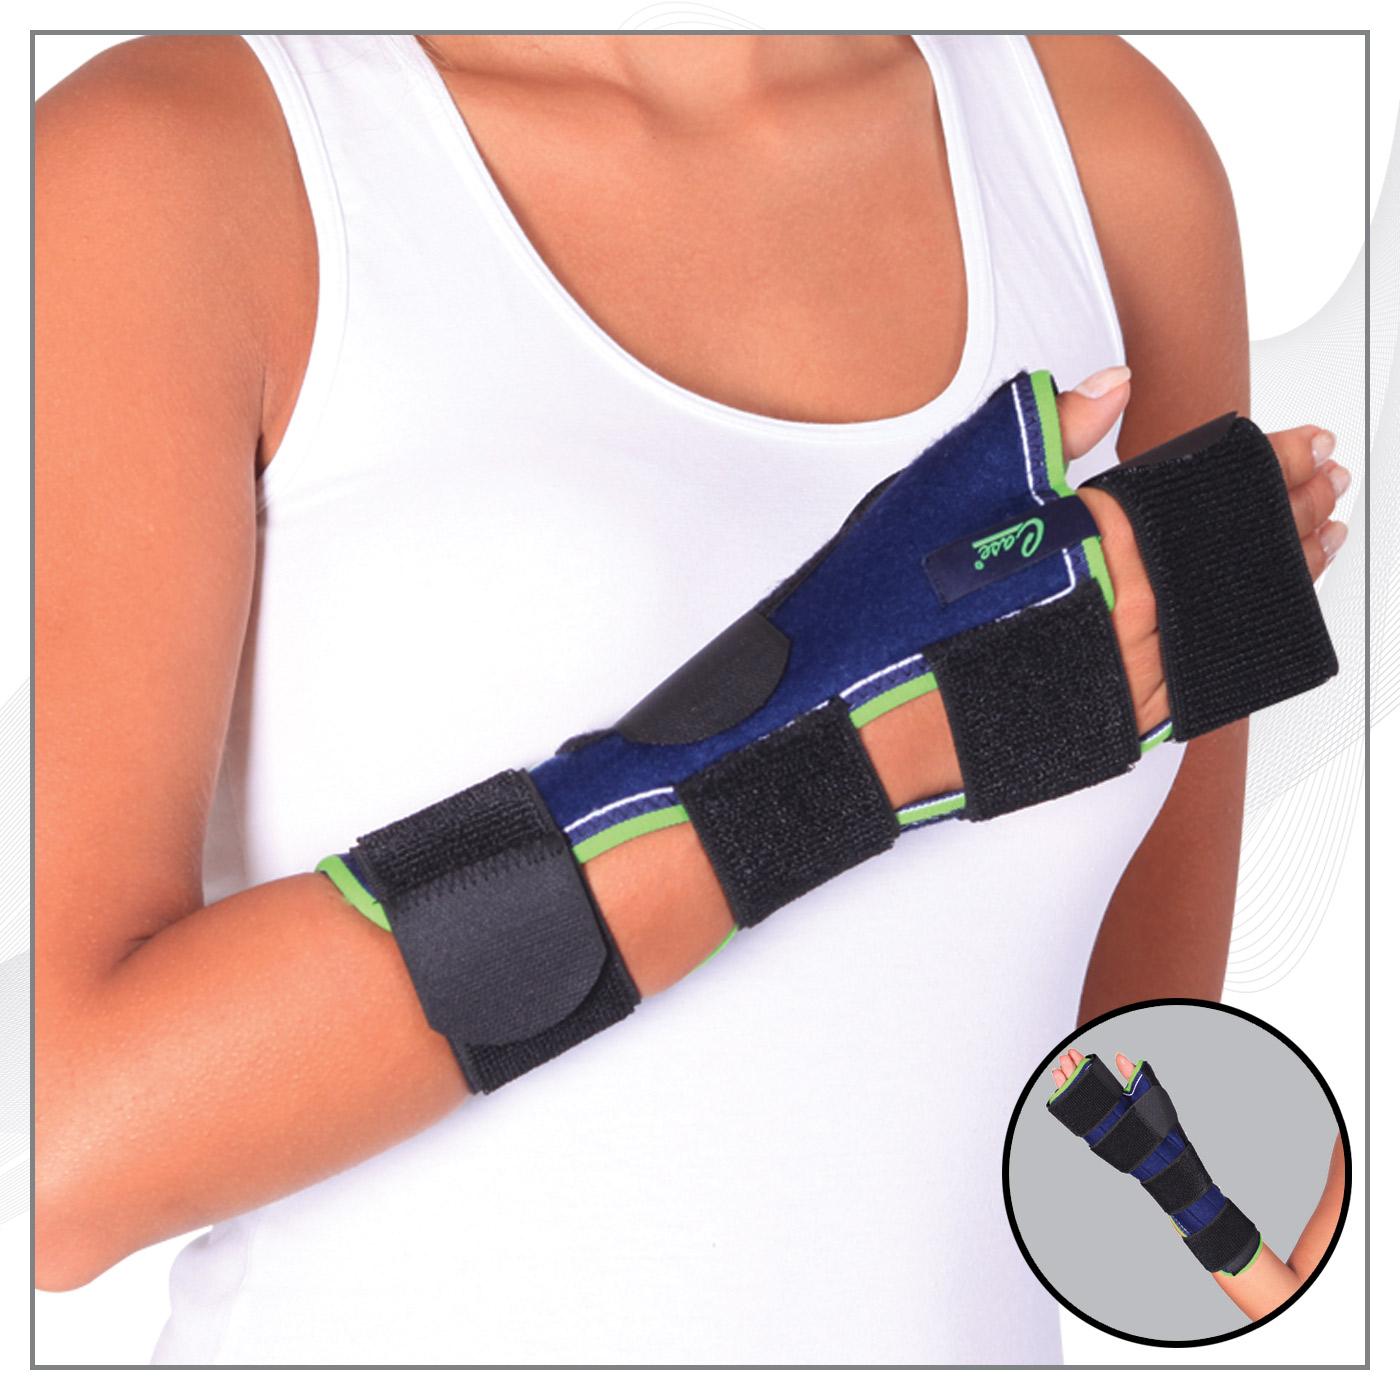 elbow brace hb 5330 abc medical